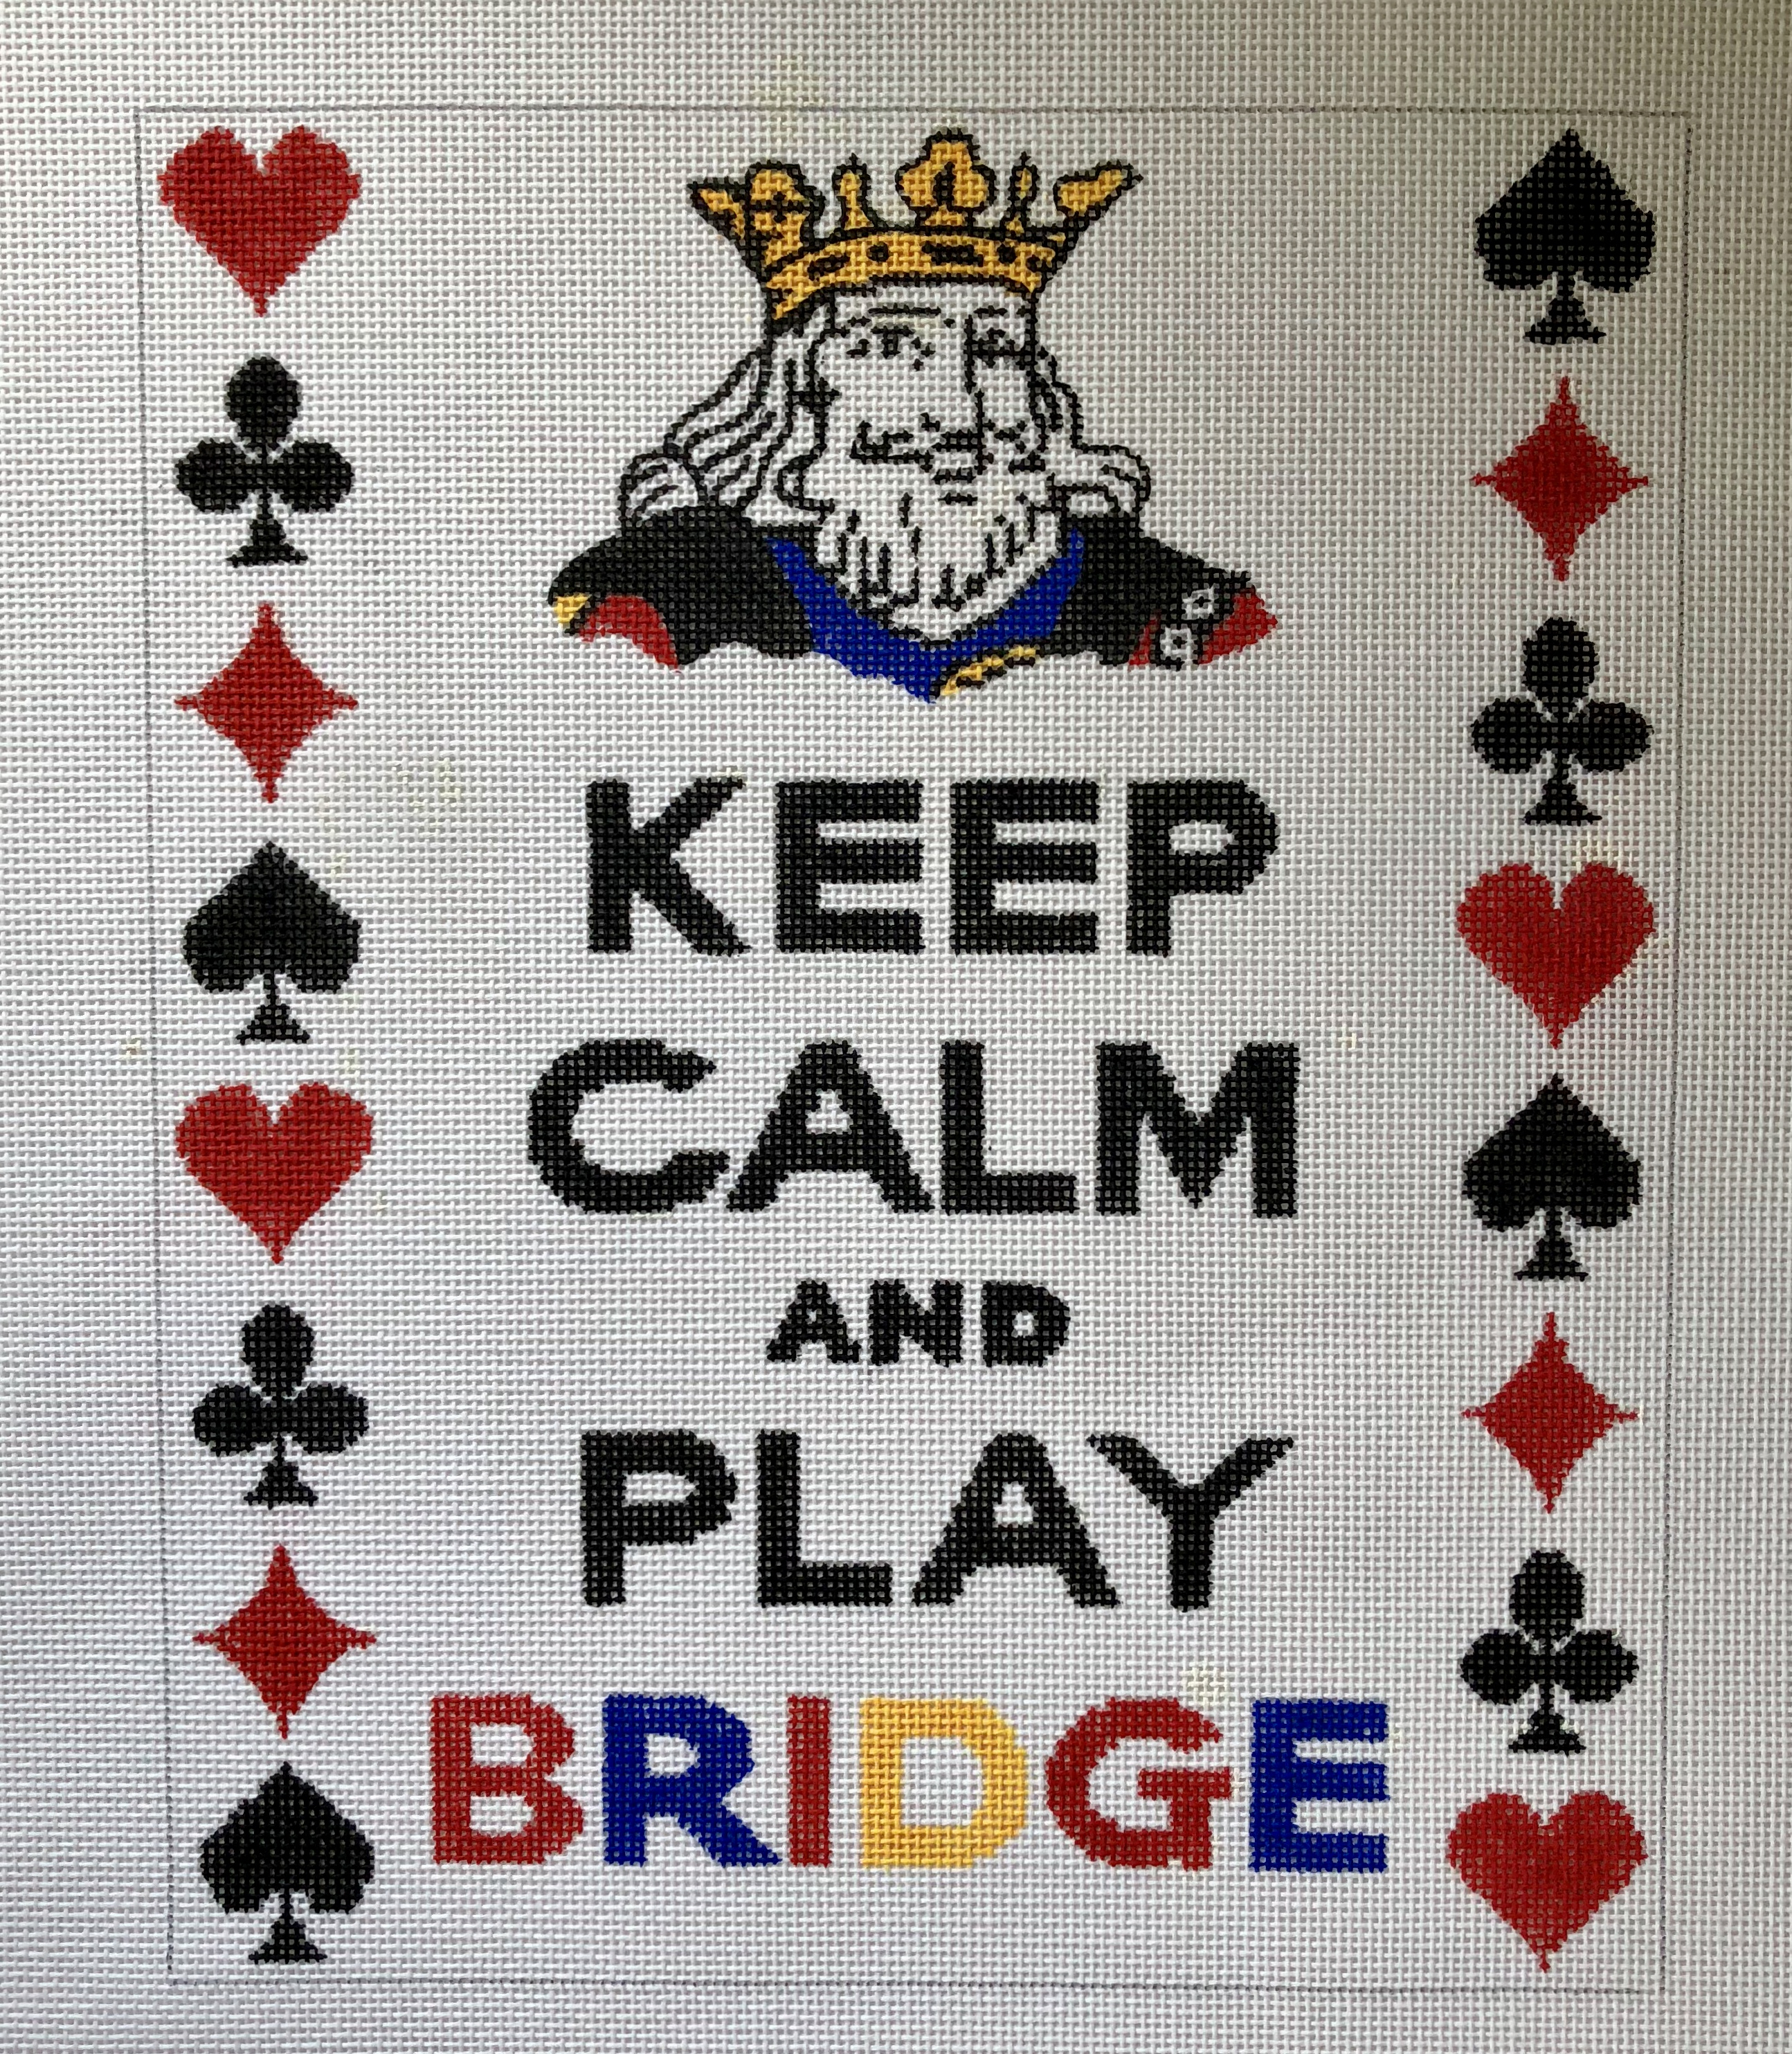 Kate Dickerson - Keep Calm and Play Bridge